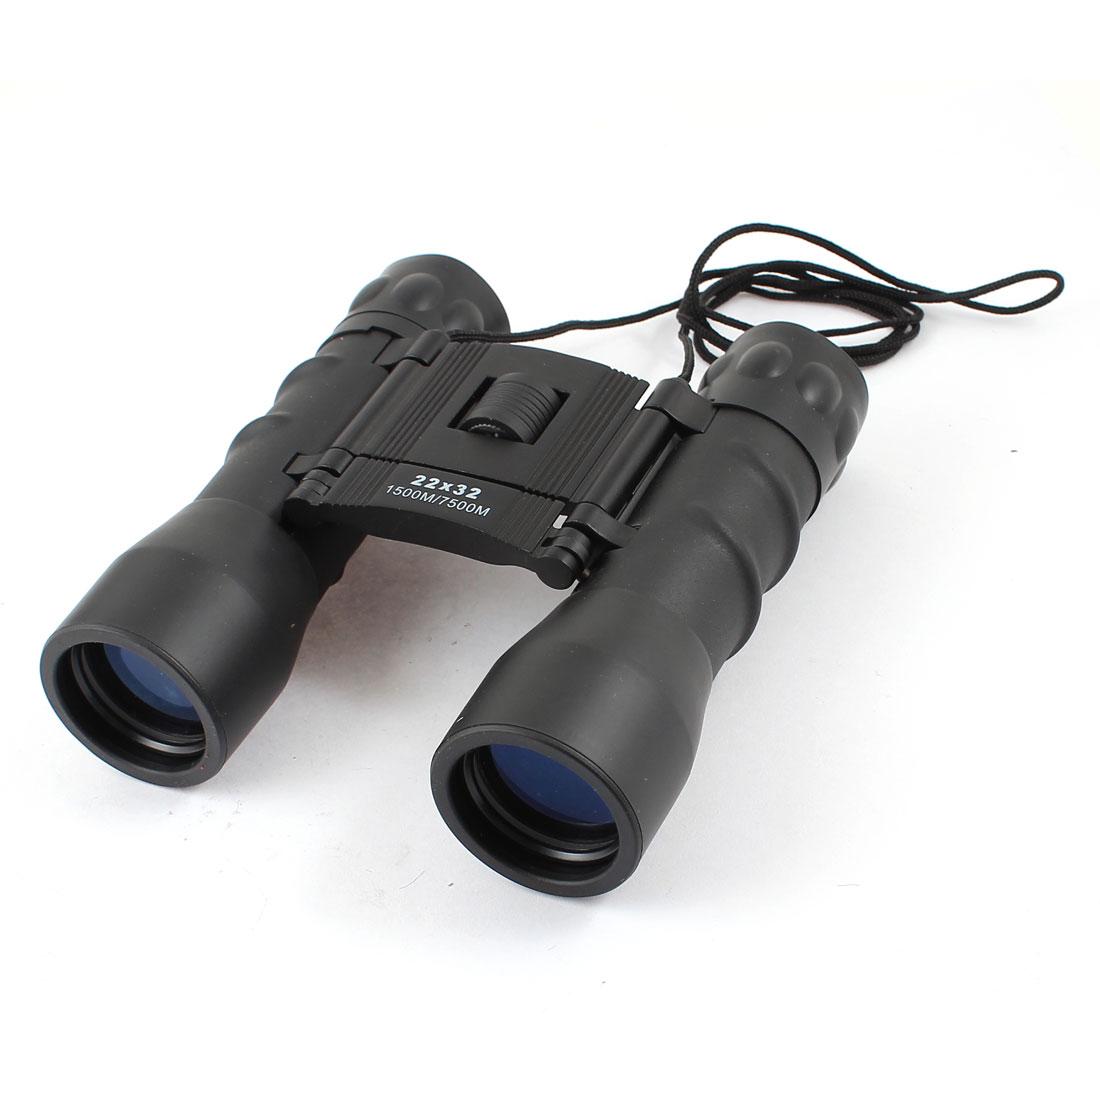 Black 22x32 1500M/7500M Day Night Double Use Compact Binoculars Telescope